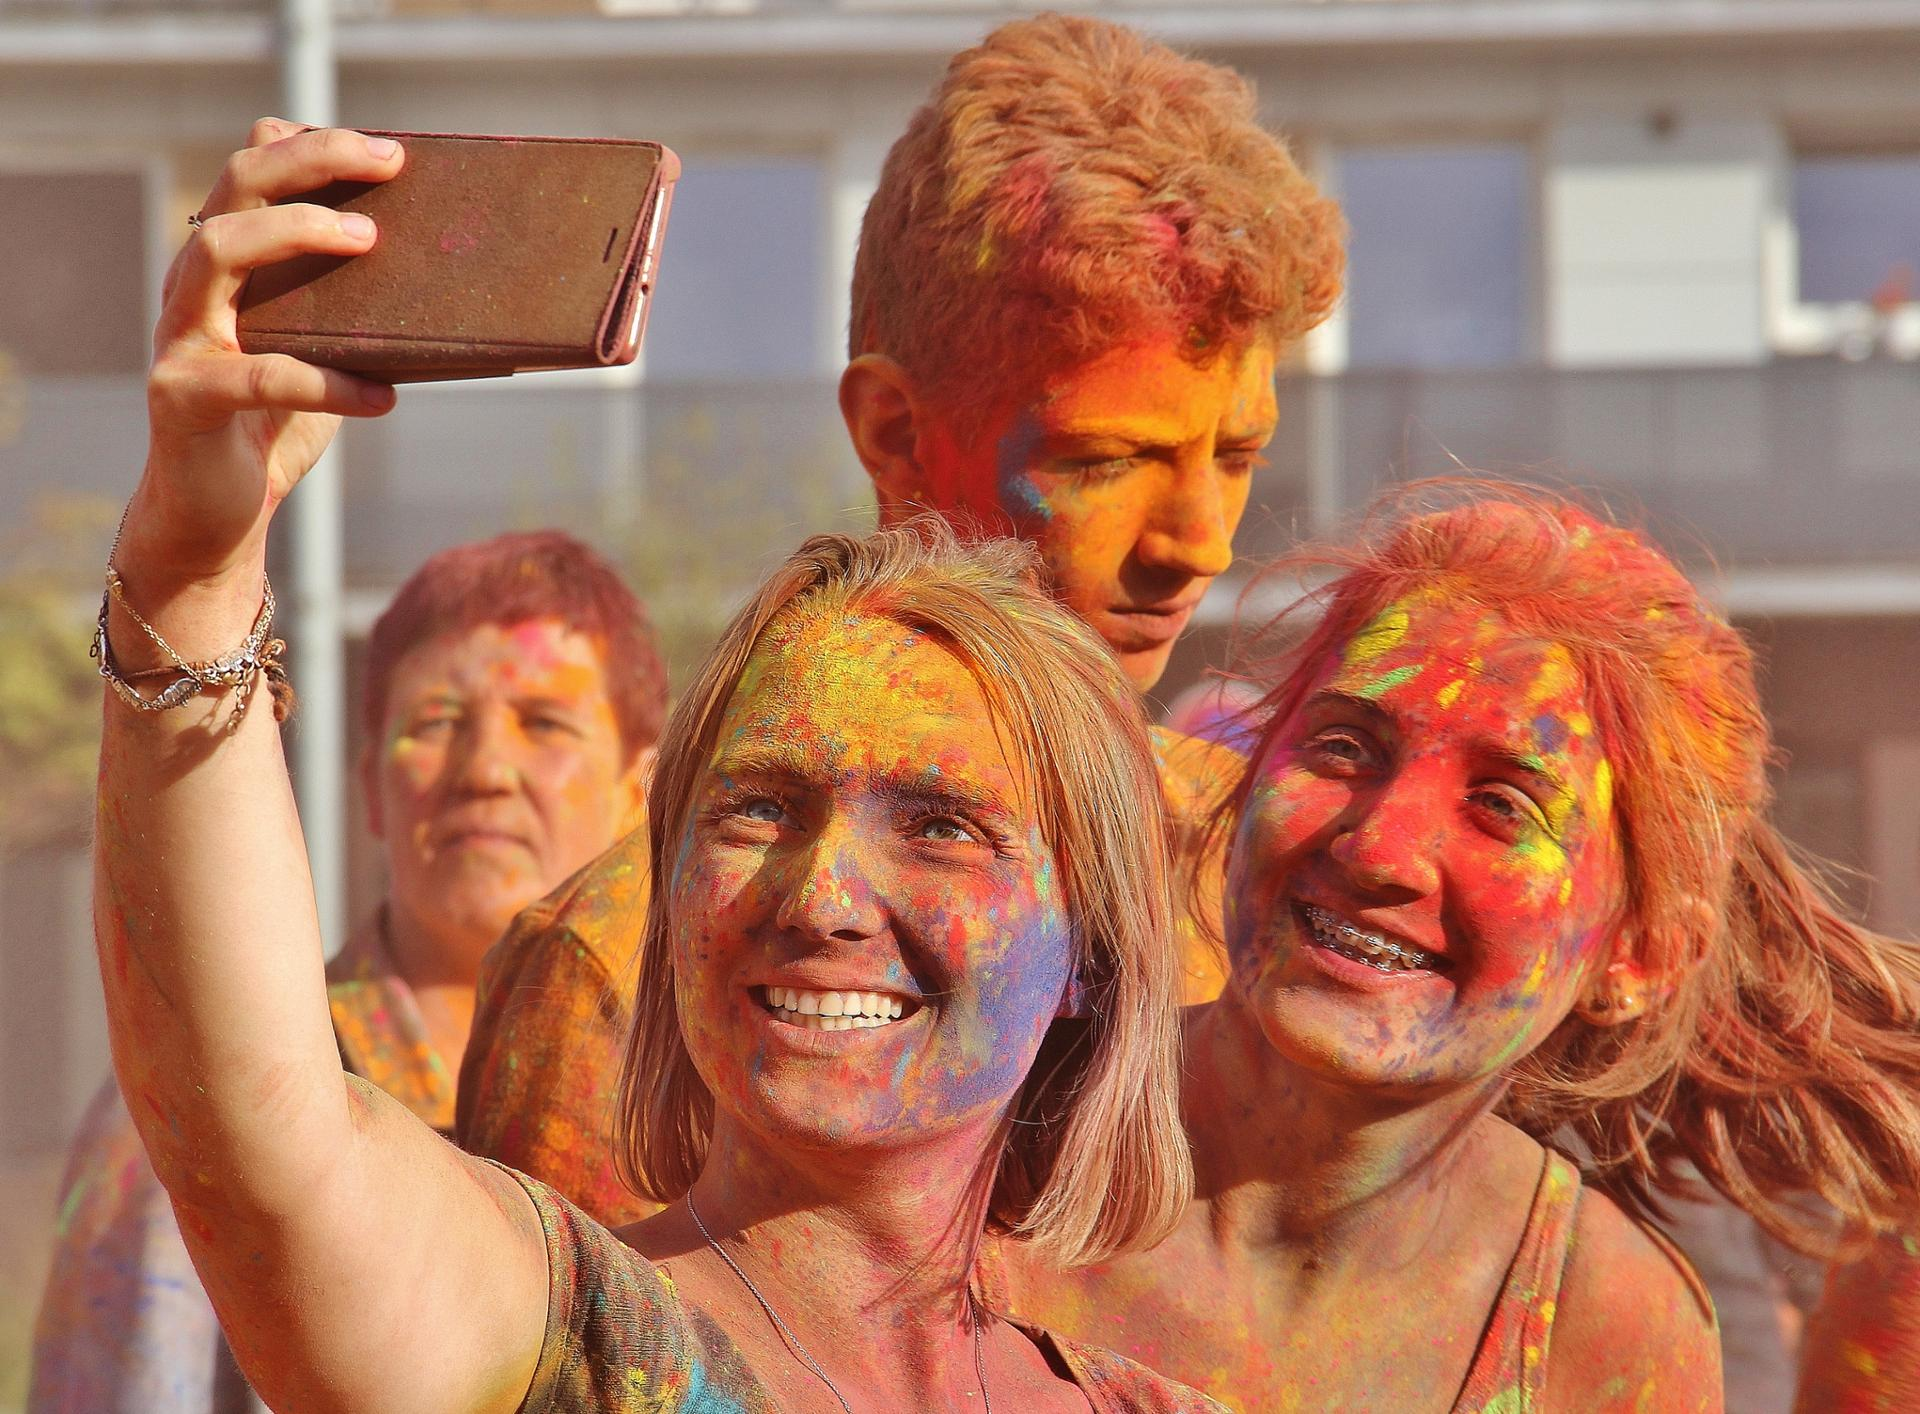 Teenagers colors